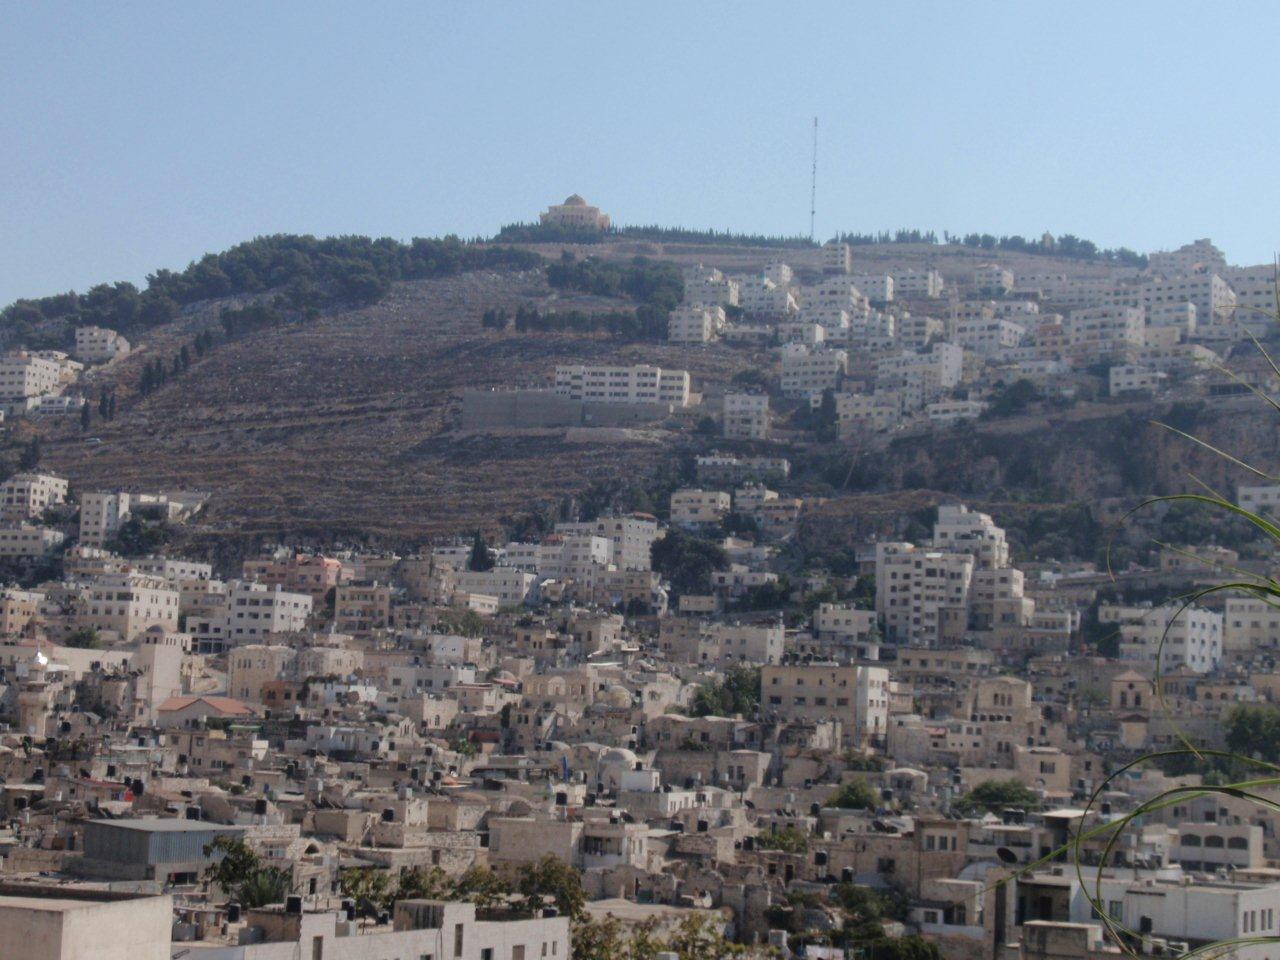 Nablus-Nablus: نابلس منظر عام يوم 15.10.2012 ...